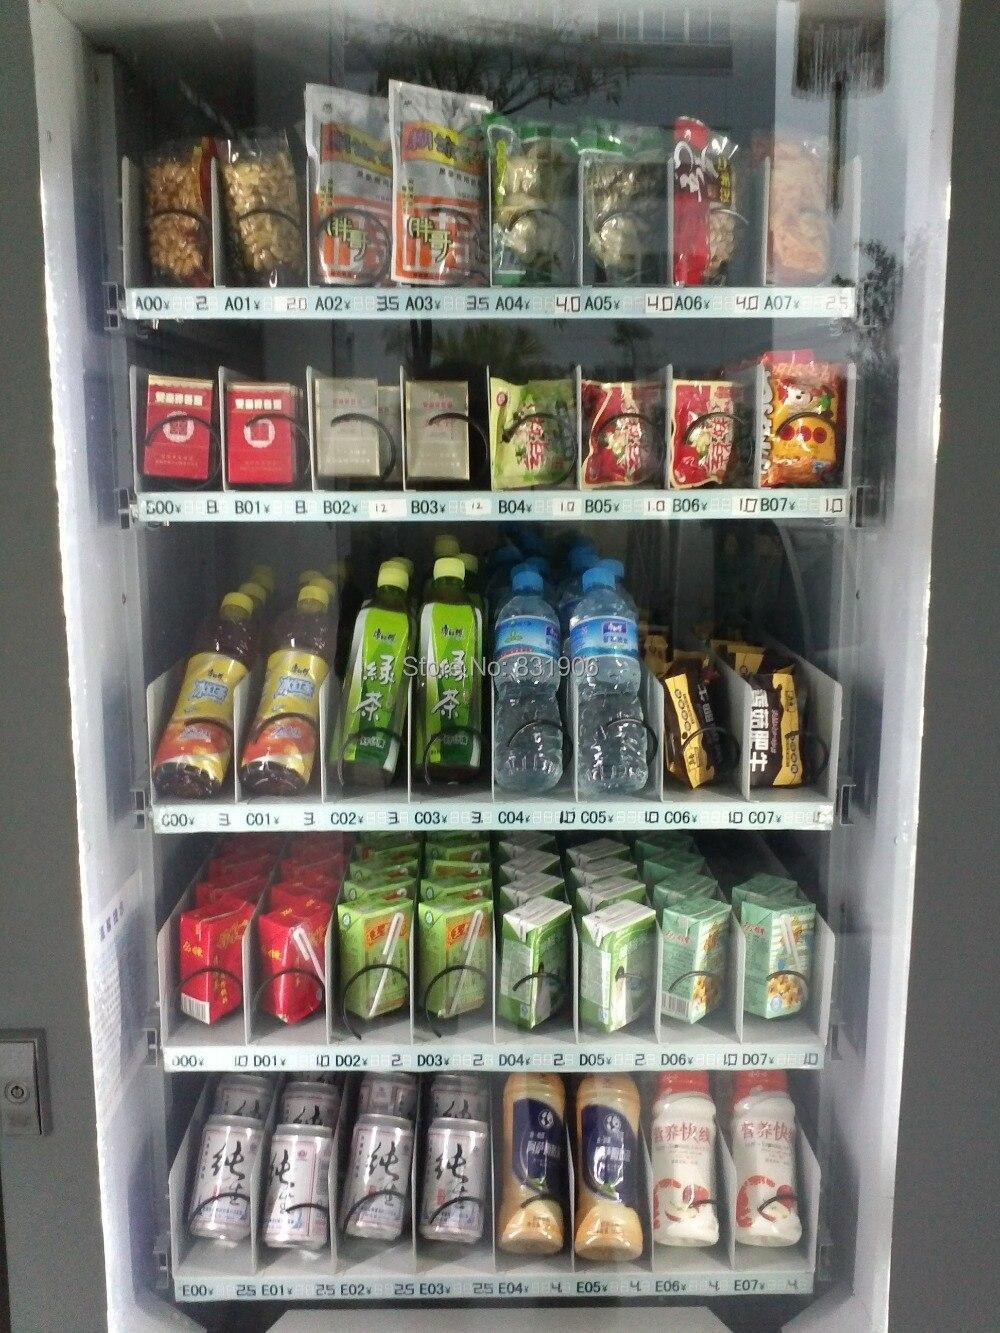 https://ae01.alicdn.com/kf/HTB18eNdKFXXXXc5XFXXq6xXFXXXP/big-snack-vending-machine.jpg